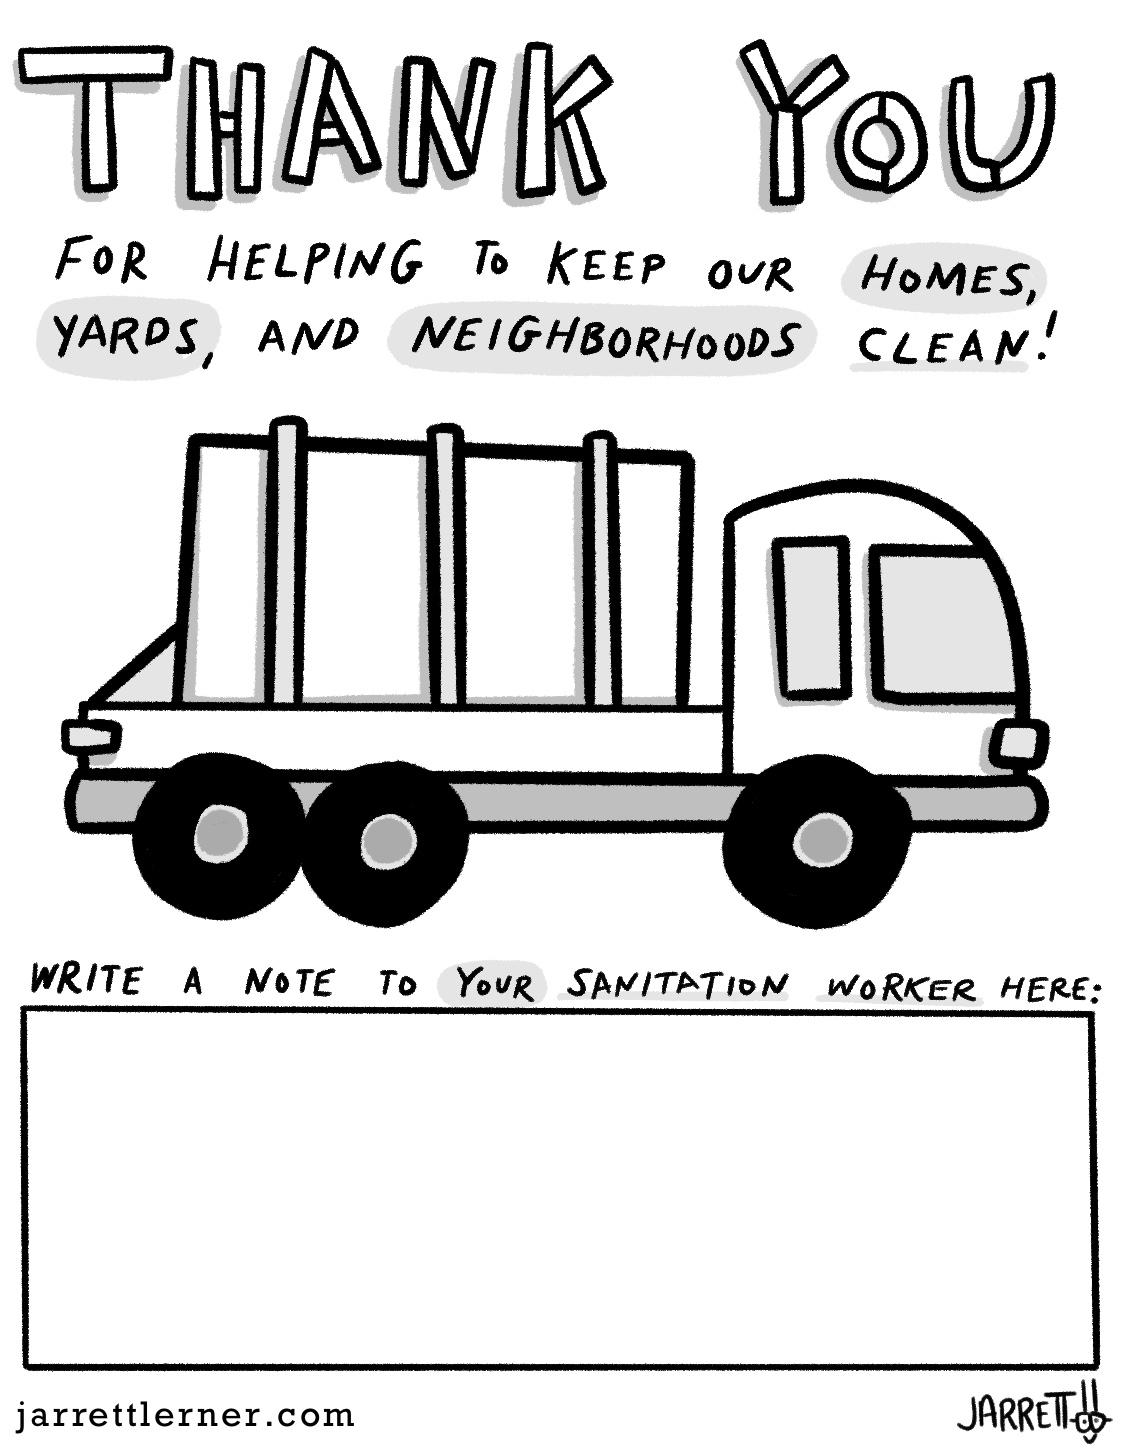 sanitation worker.jpg